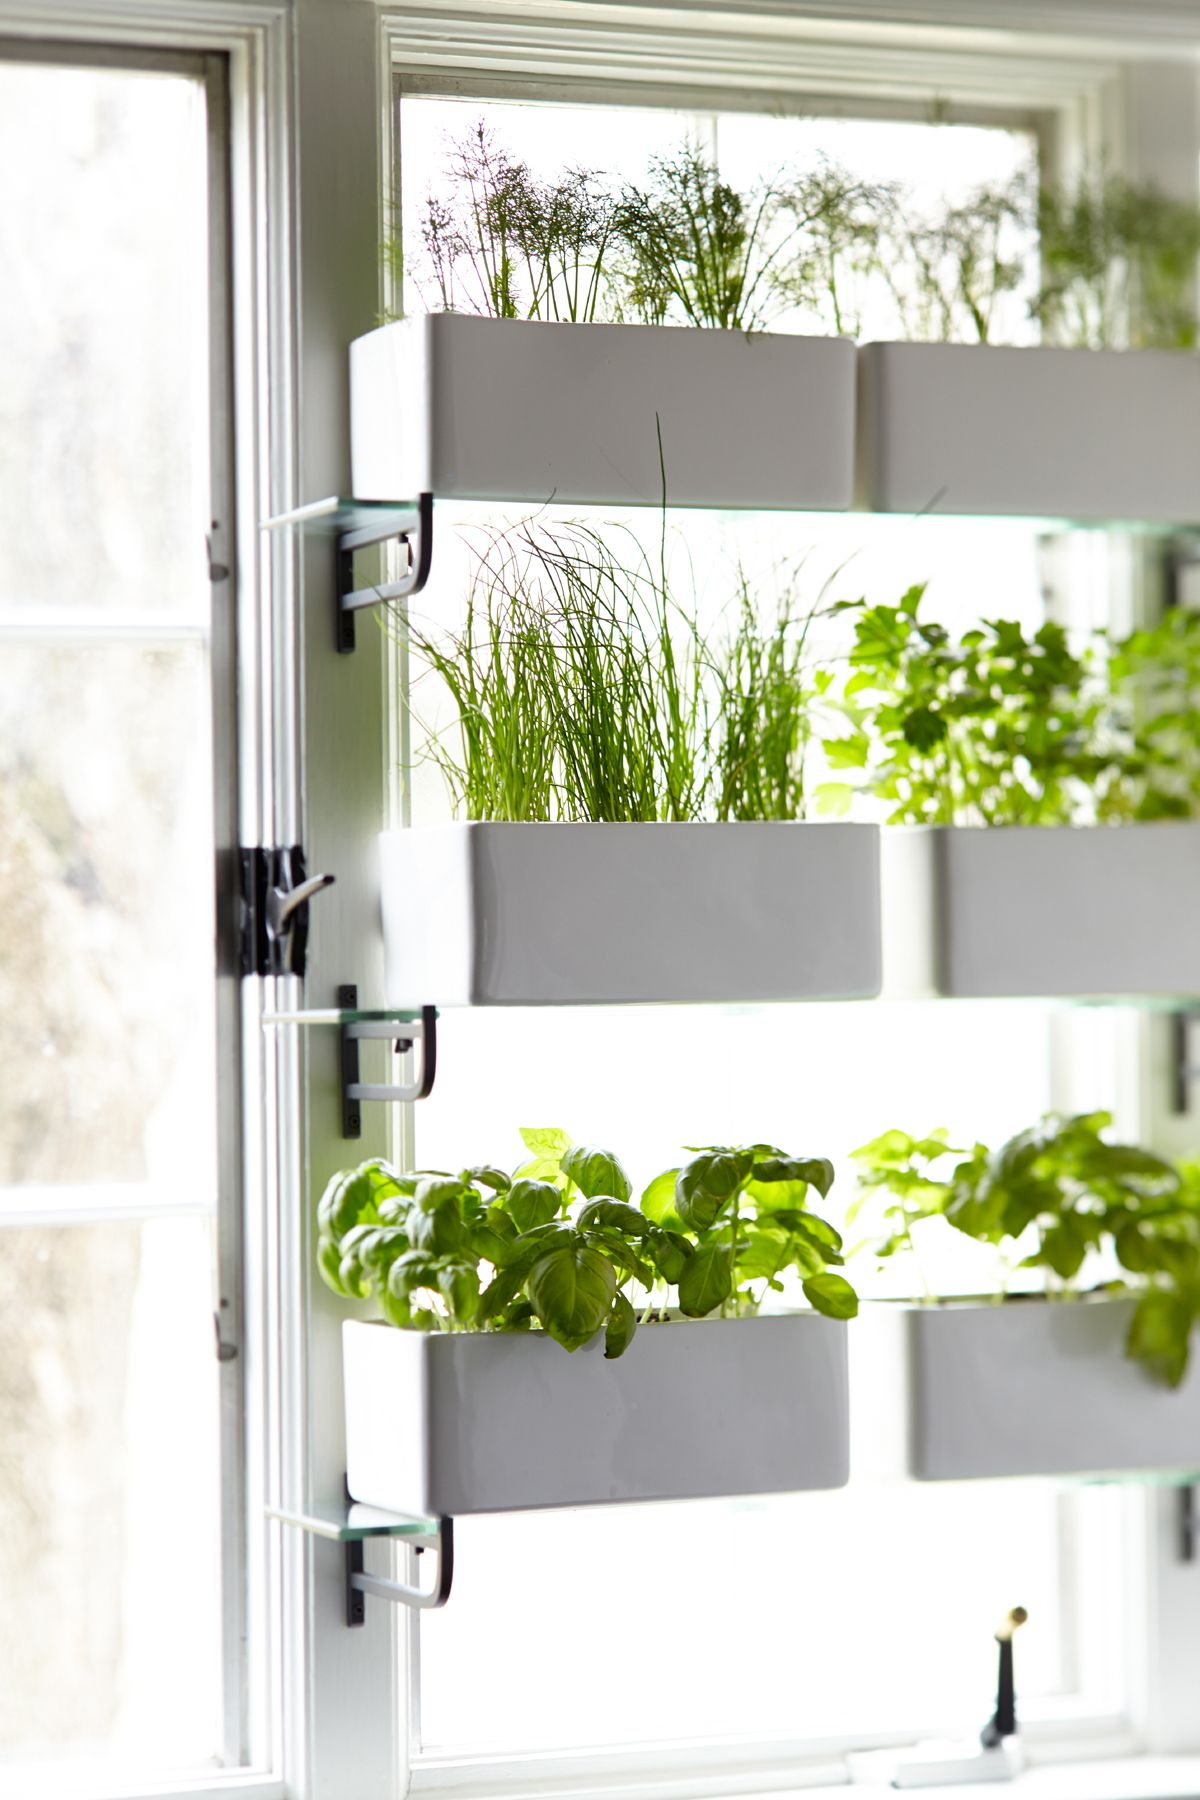 kitchen window privacy garden using Ikea glass shelves | Fönster ...